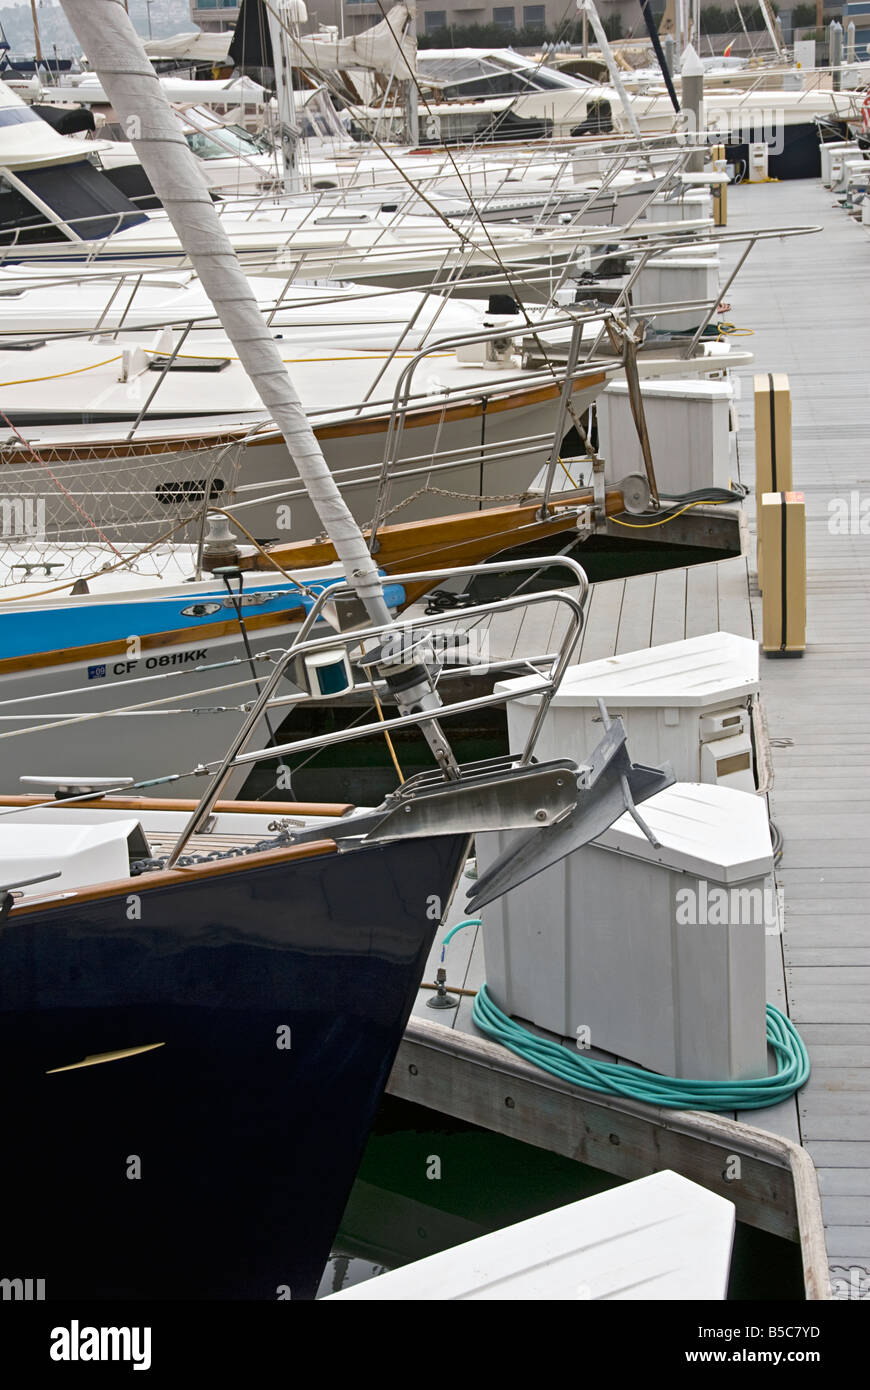 Tahiti Boat Stock Photos & Tahiti Boat Stock Images - Alamy